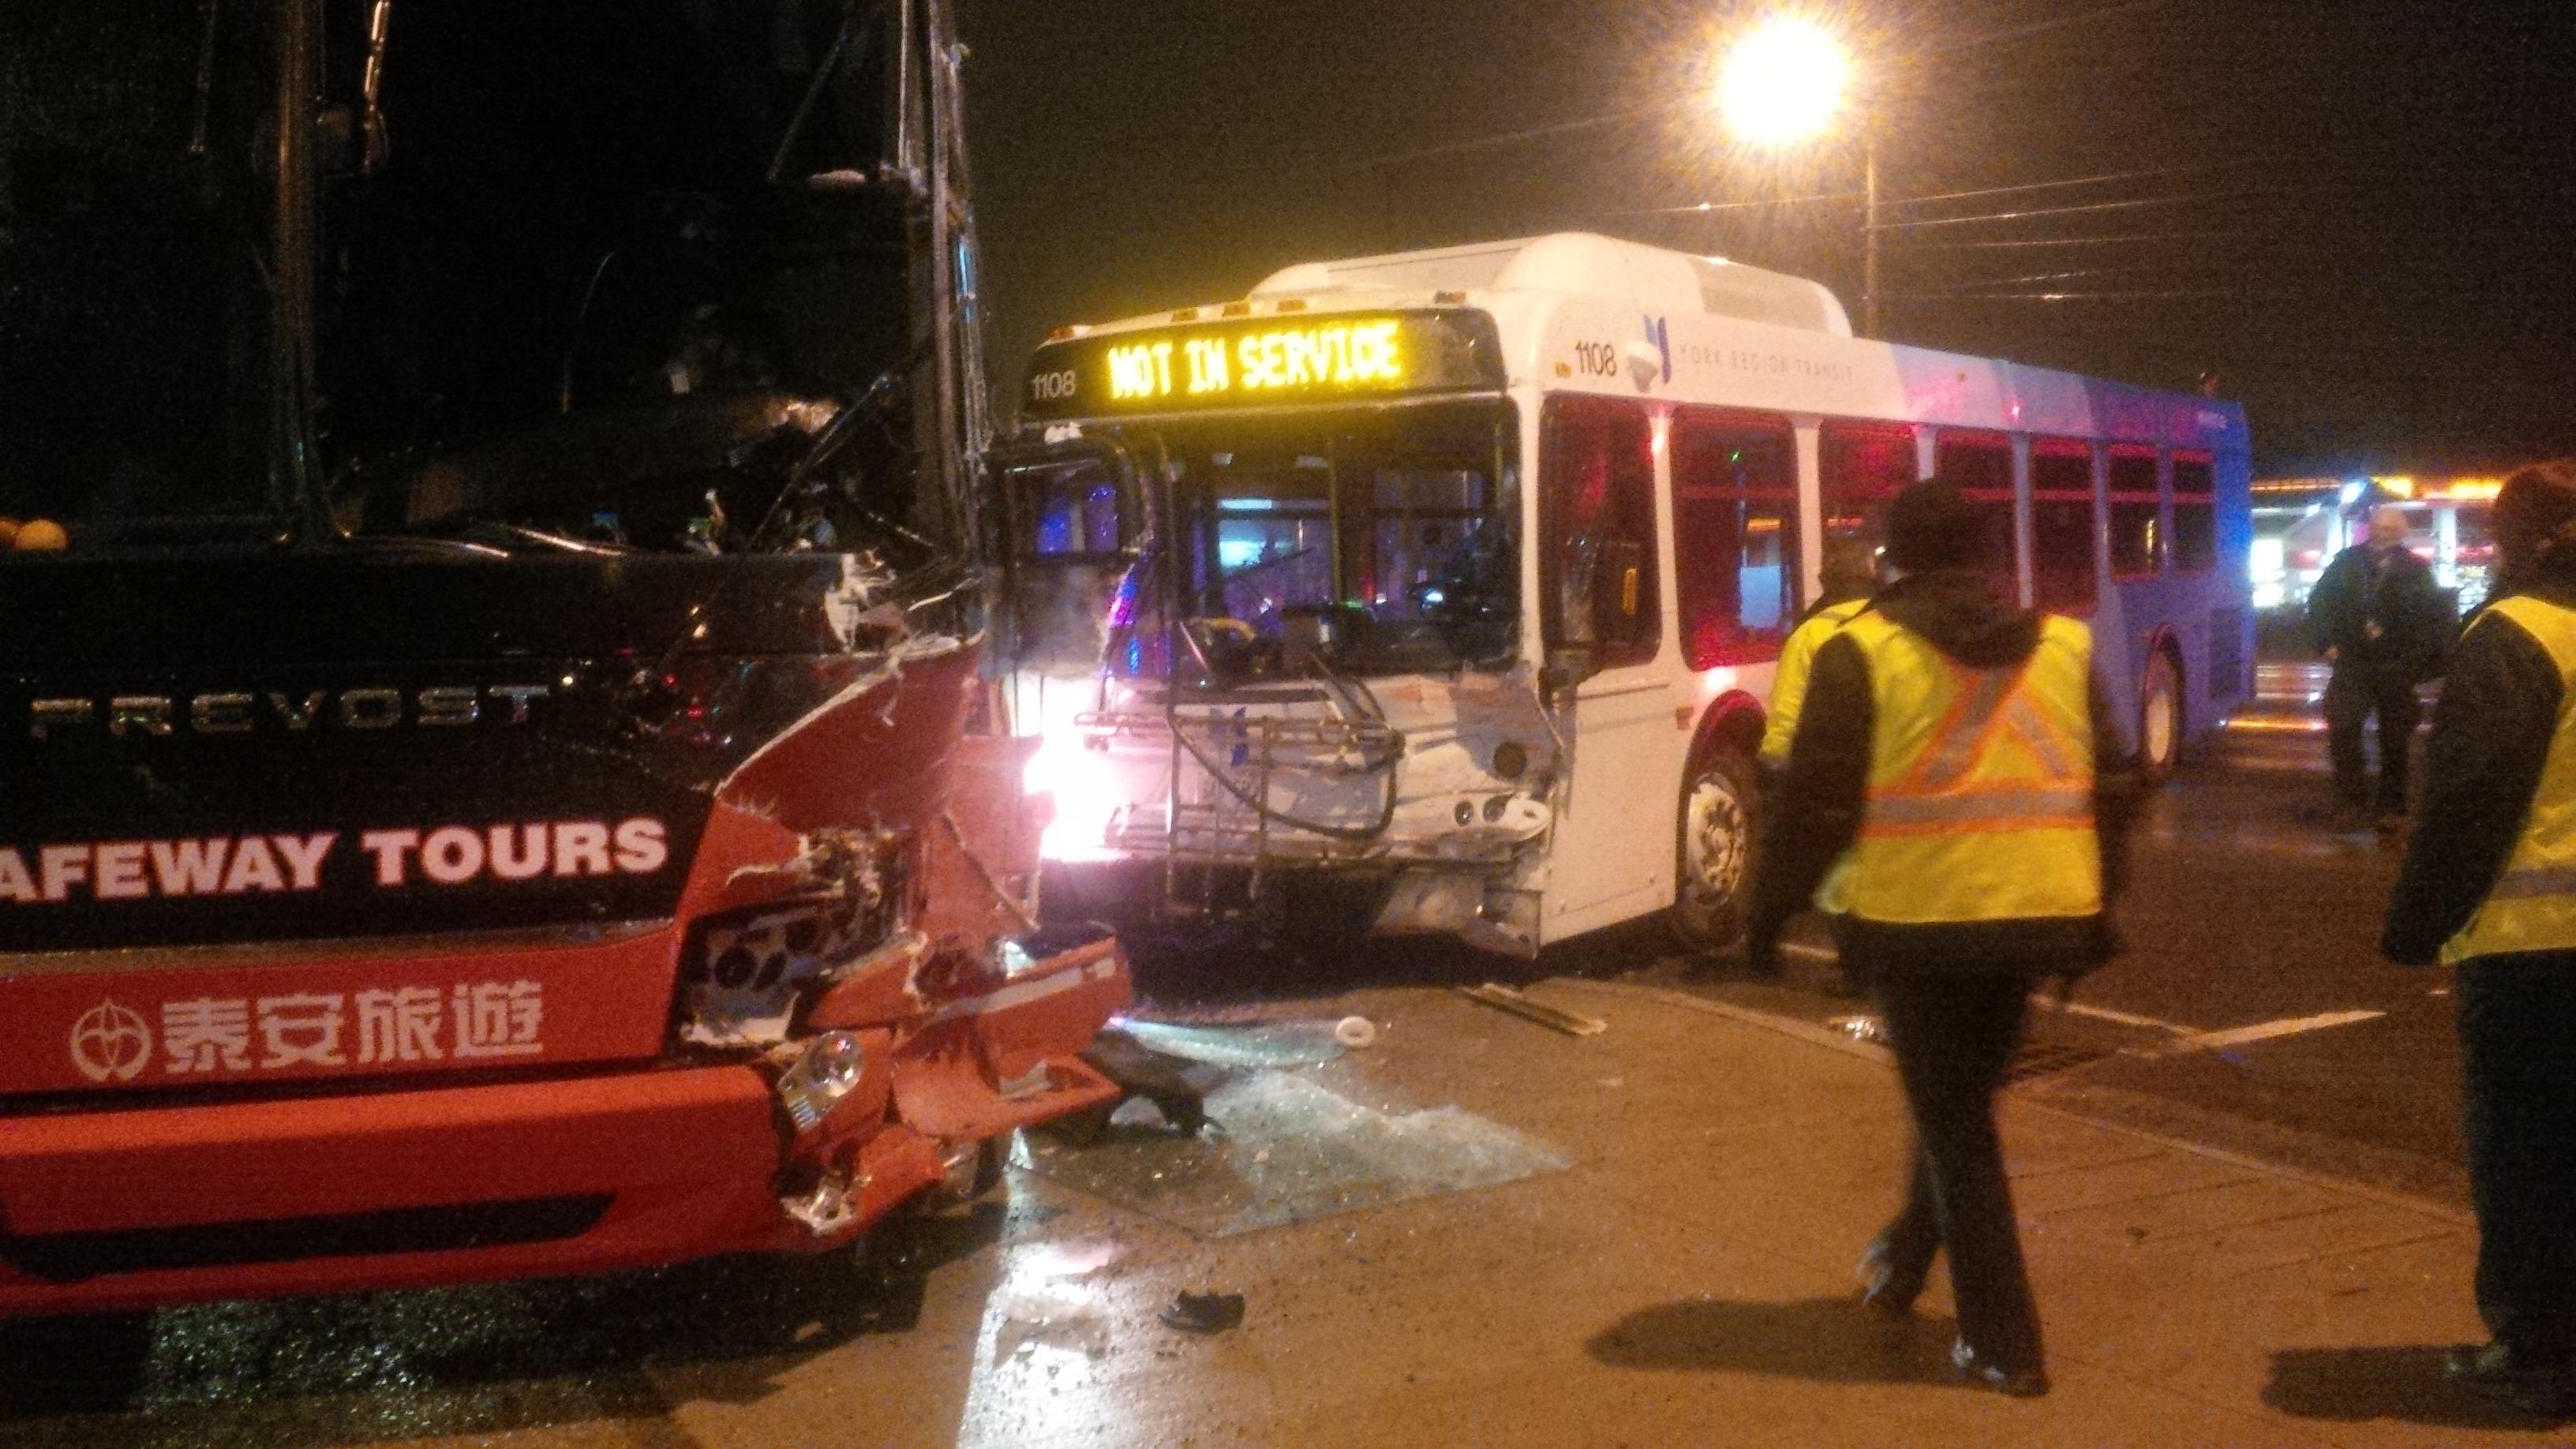 A crash at Yonge Street and Highway 7 sent six people to hospital on Nov. 25, 2016. CITYNEWS/Mehrdad Nazarahari